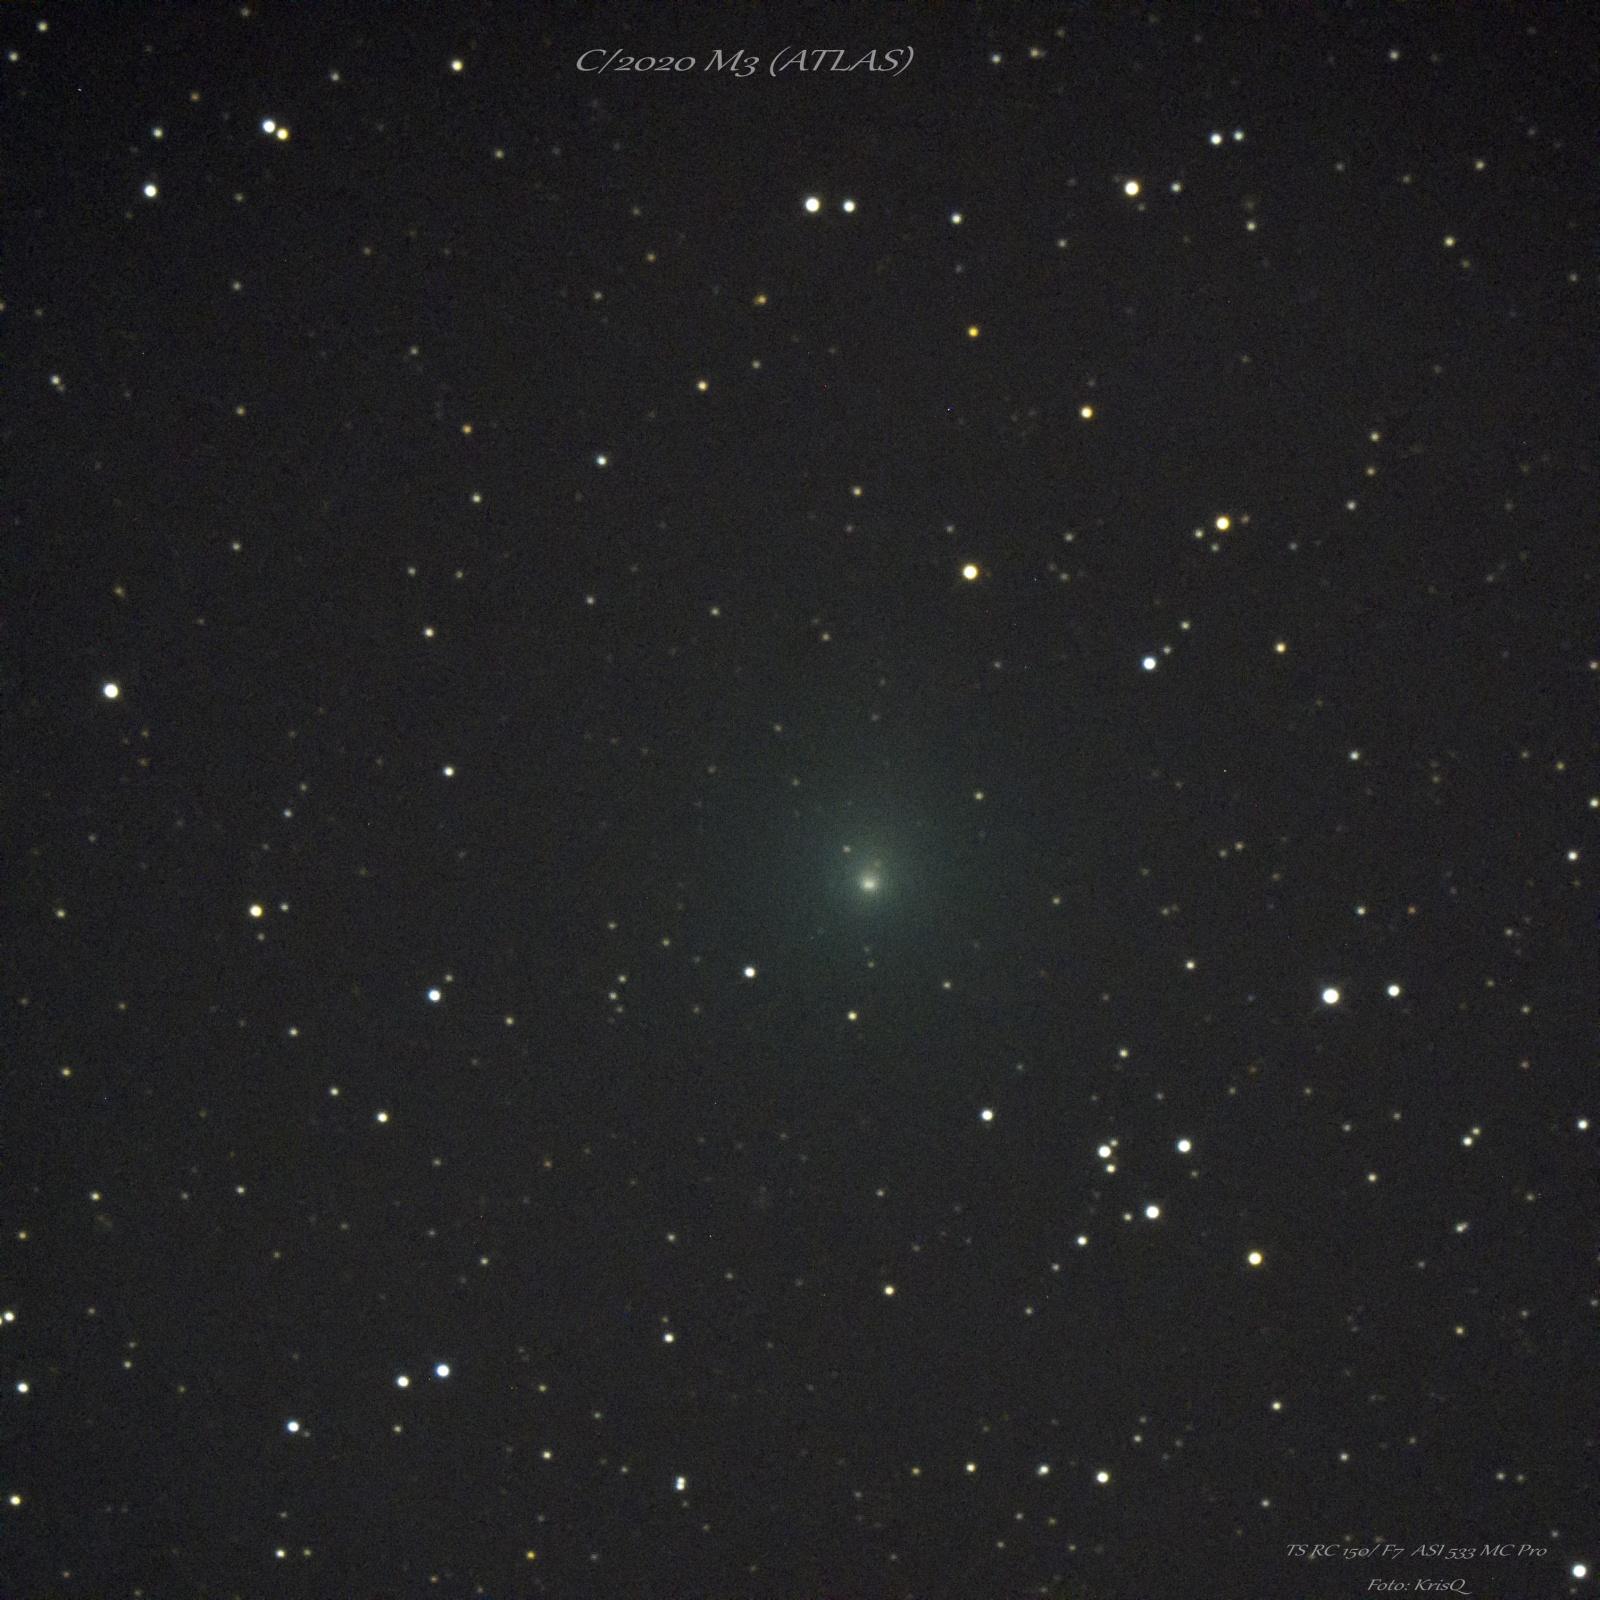 1508731493_C-2020M3(ATLAS)_1.jpg